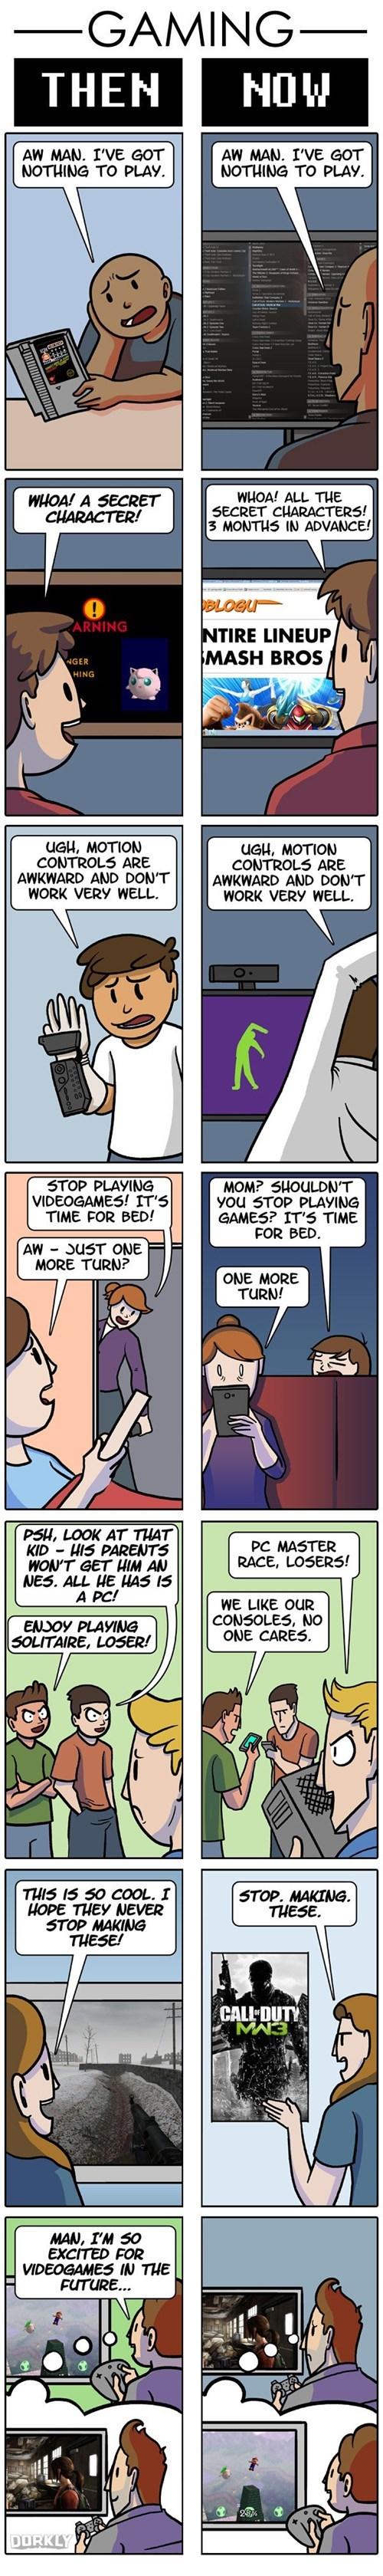 dorkly gaming nostalgia gamers web comics - 8307757568